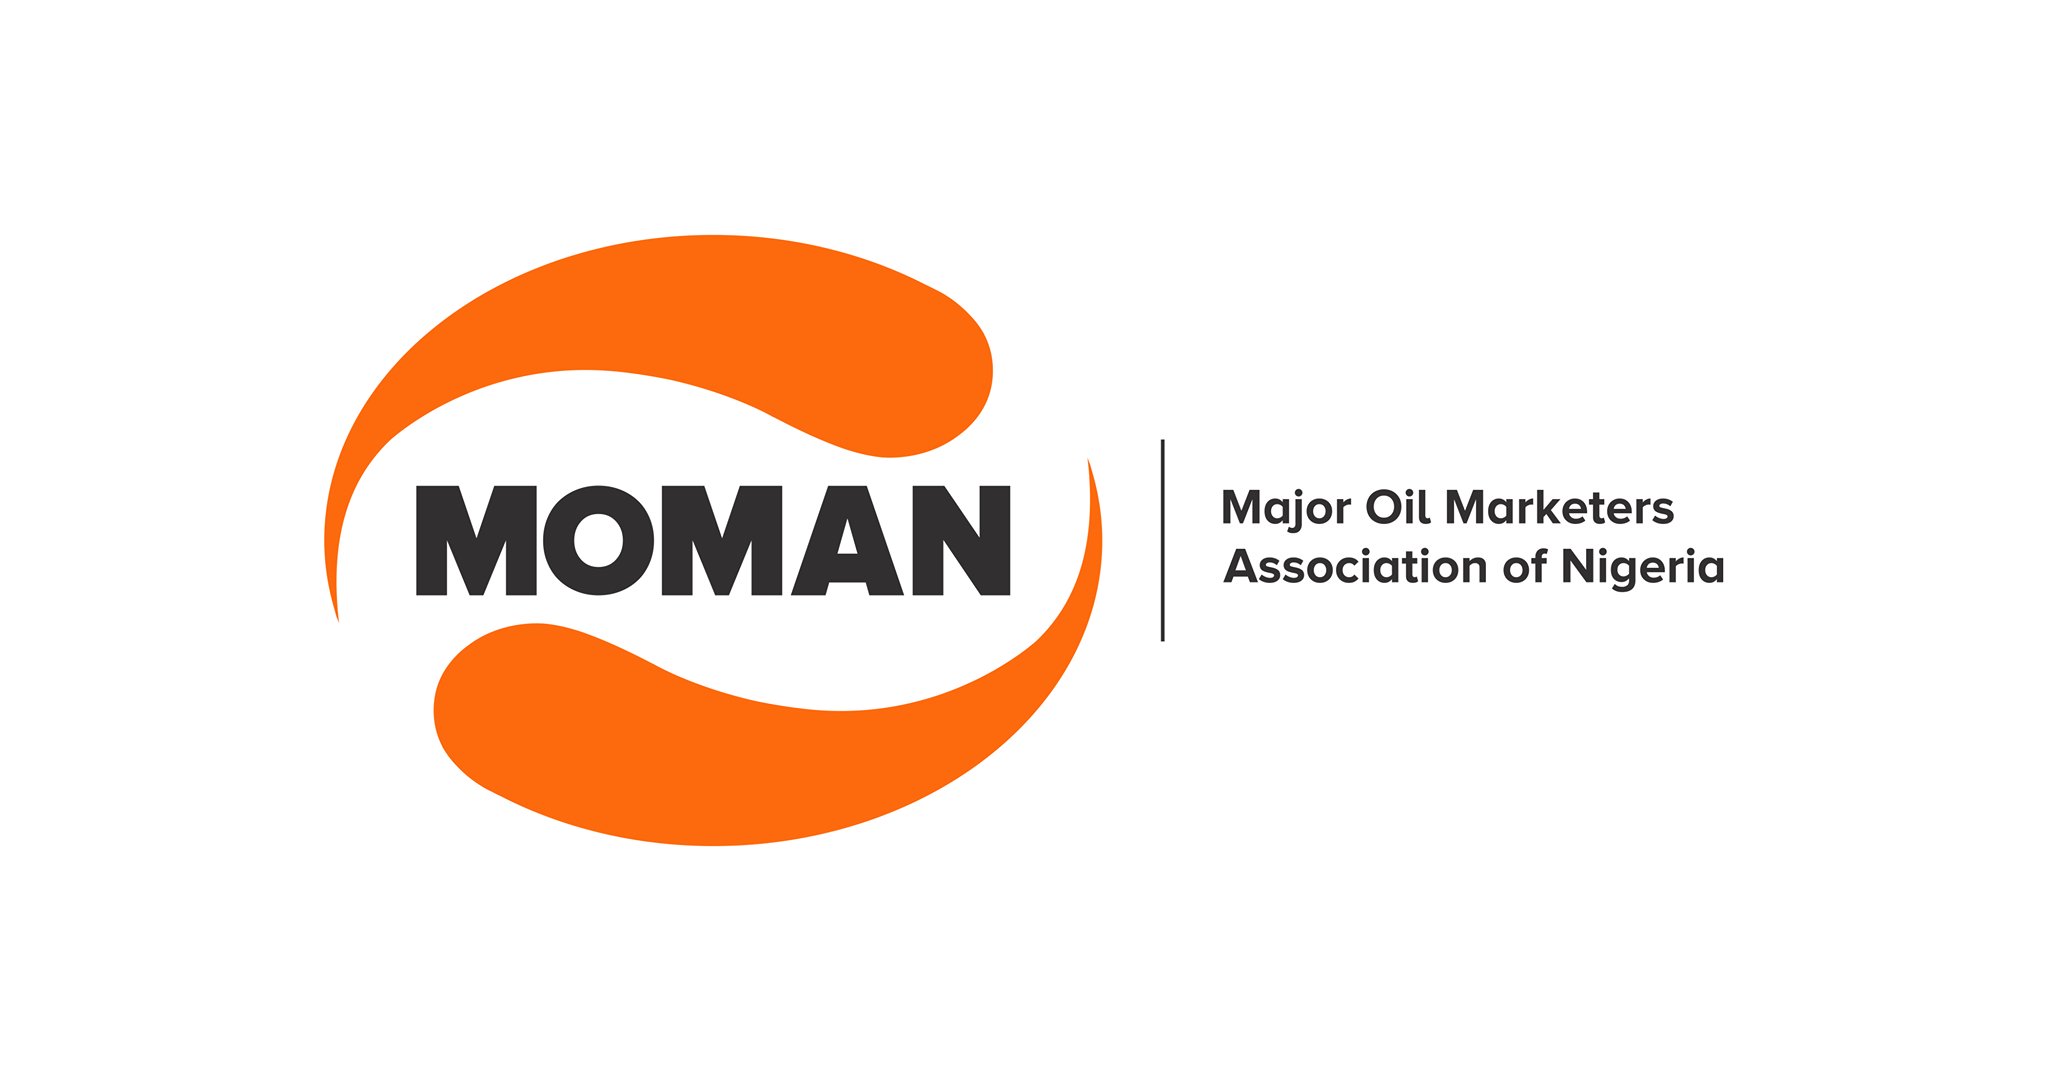 MOMAN Major Oil Marketers Association of Nigeria